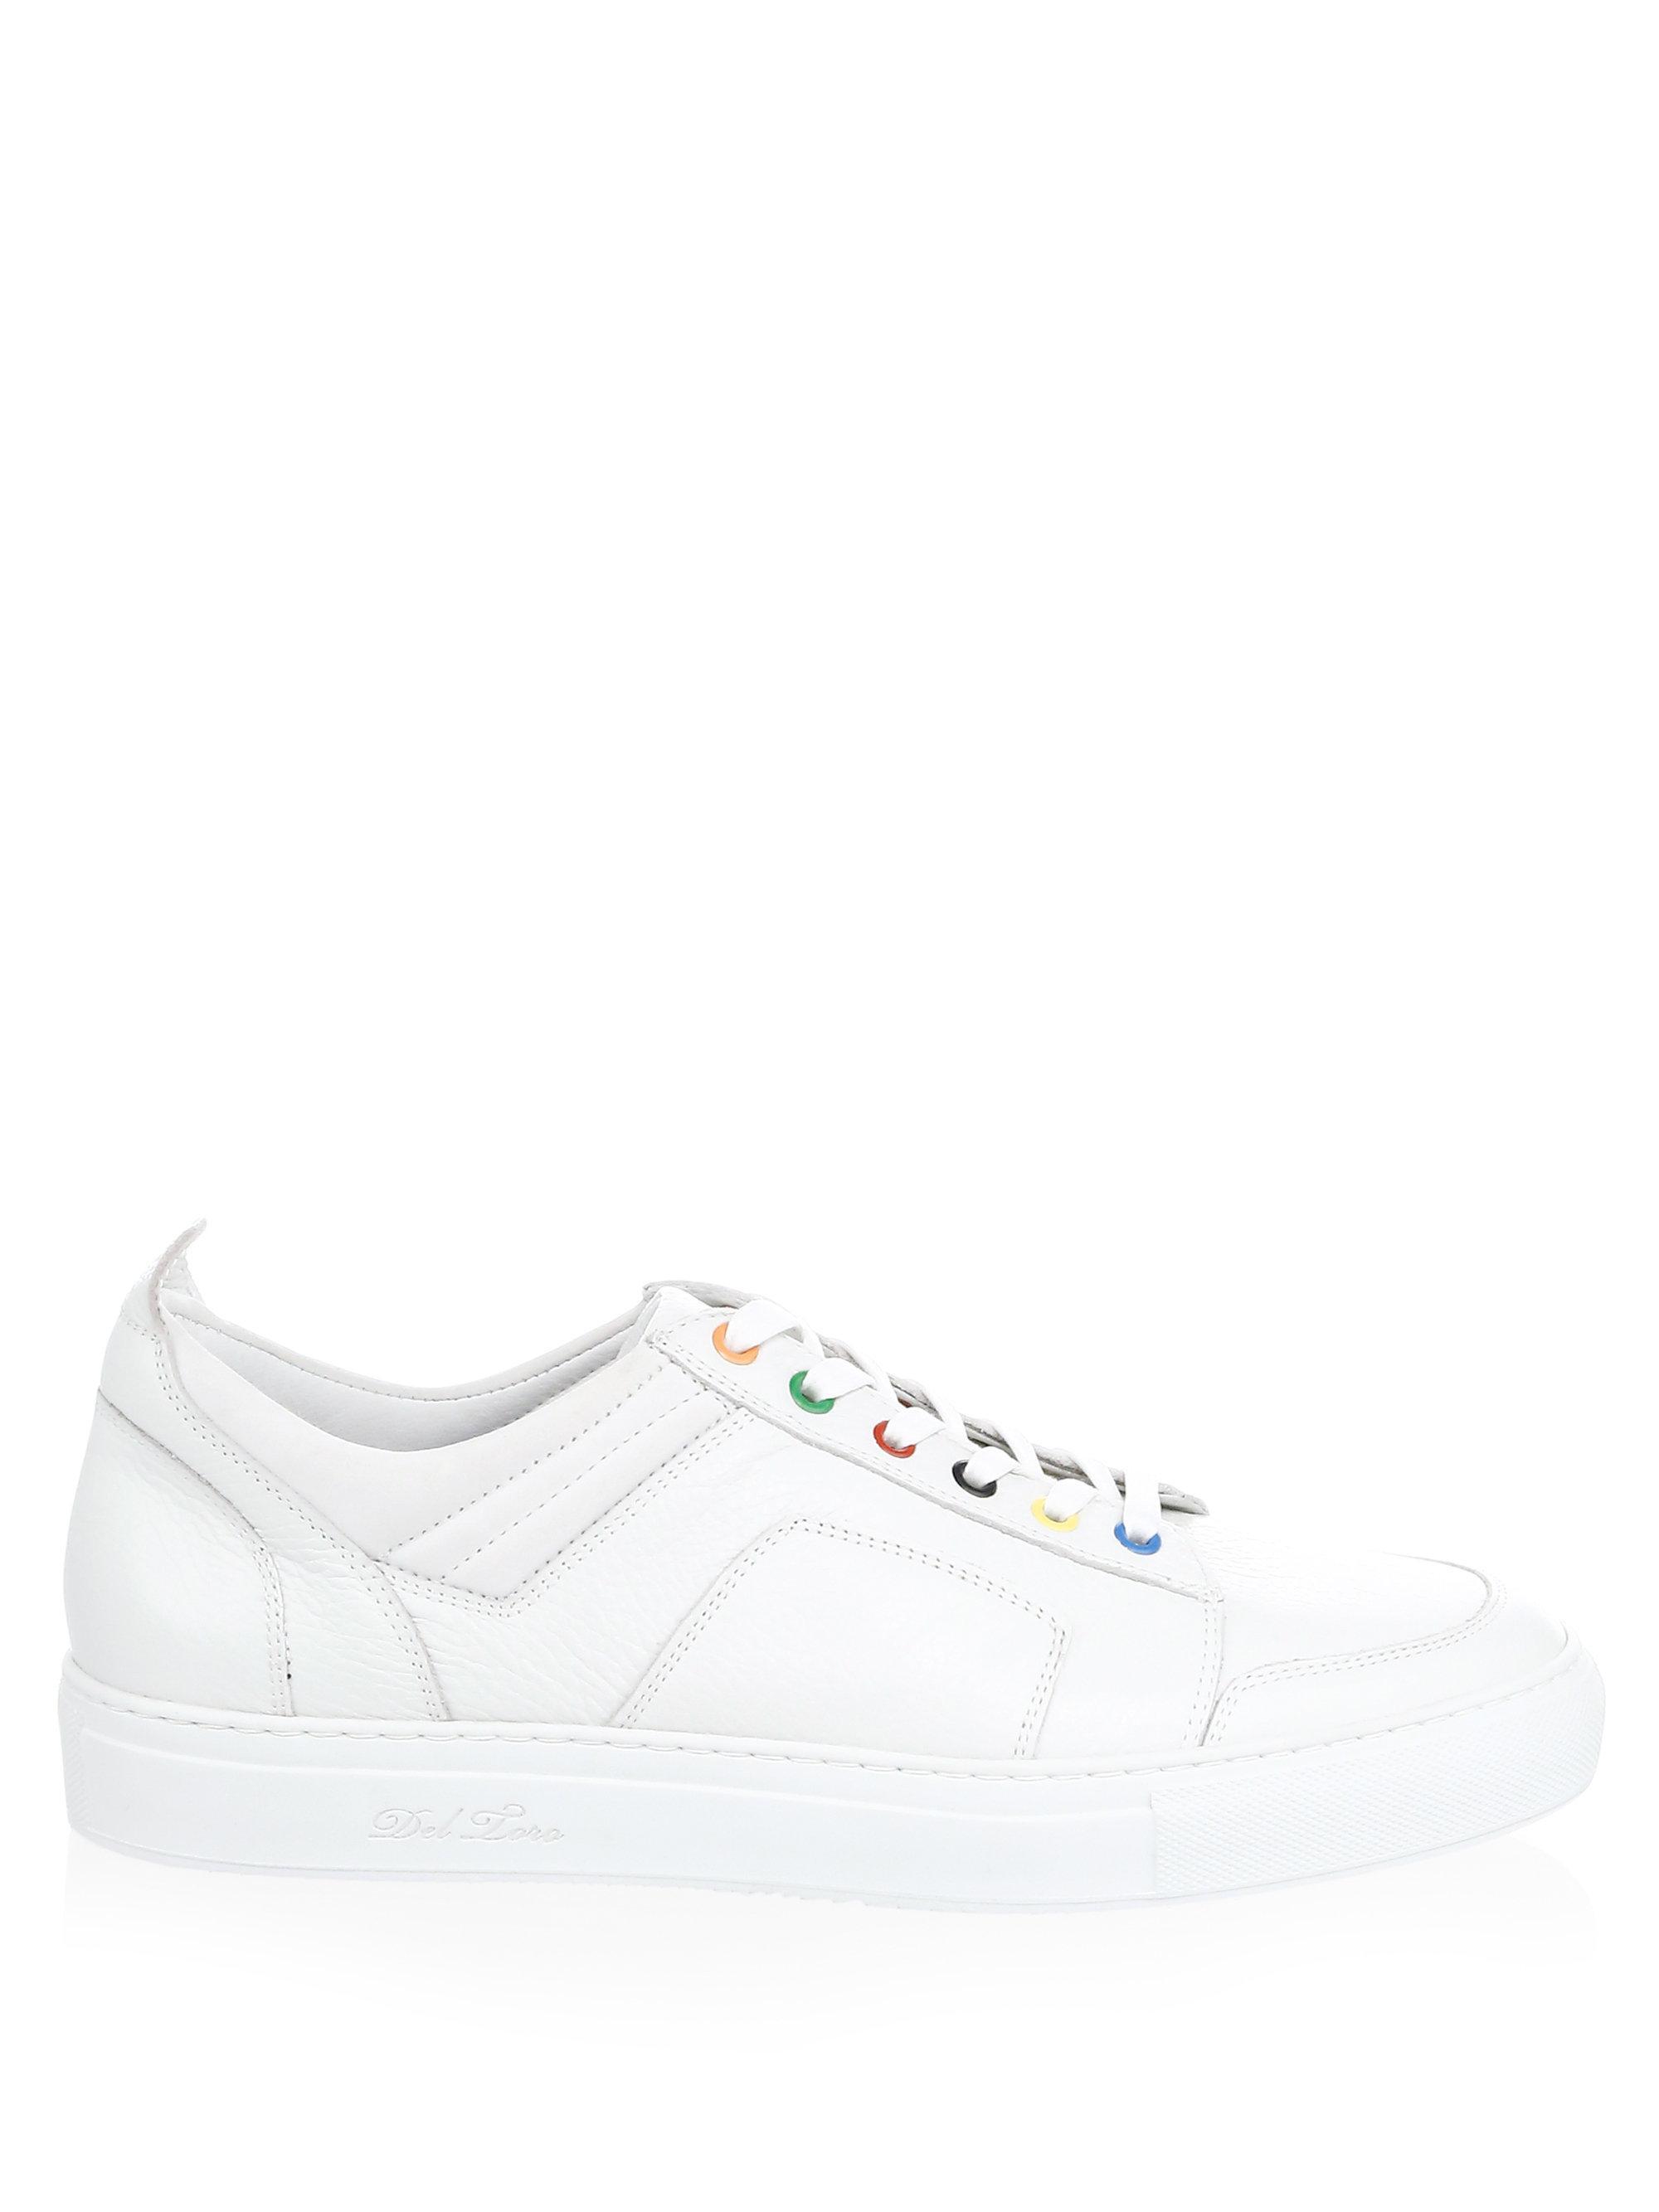 DEL TORO Multicolor Leather Low-Top Sneakers aTZpgU6Lz